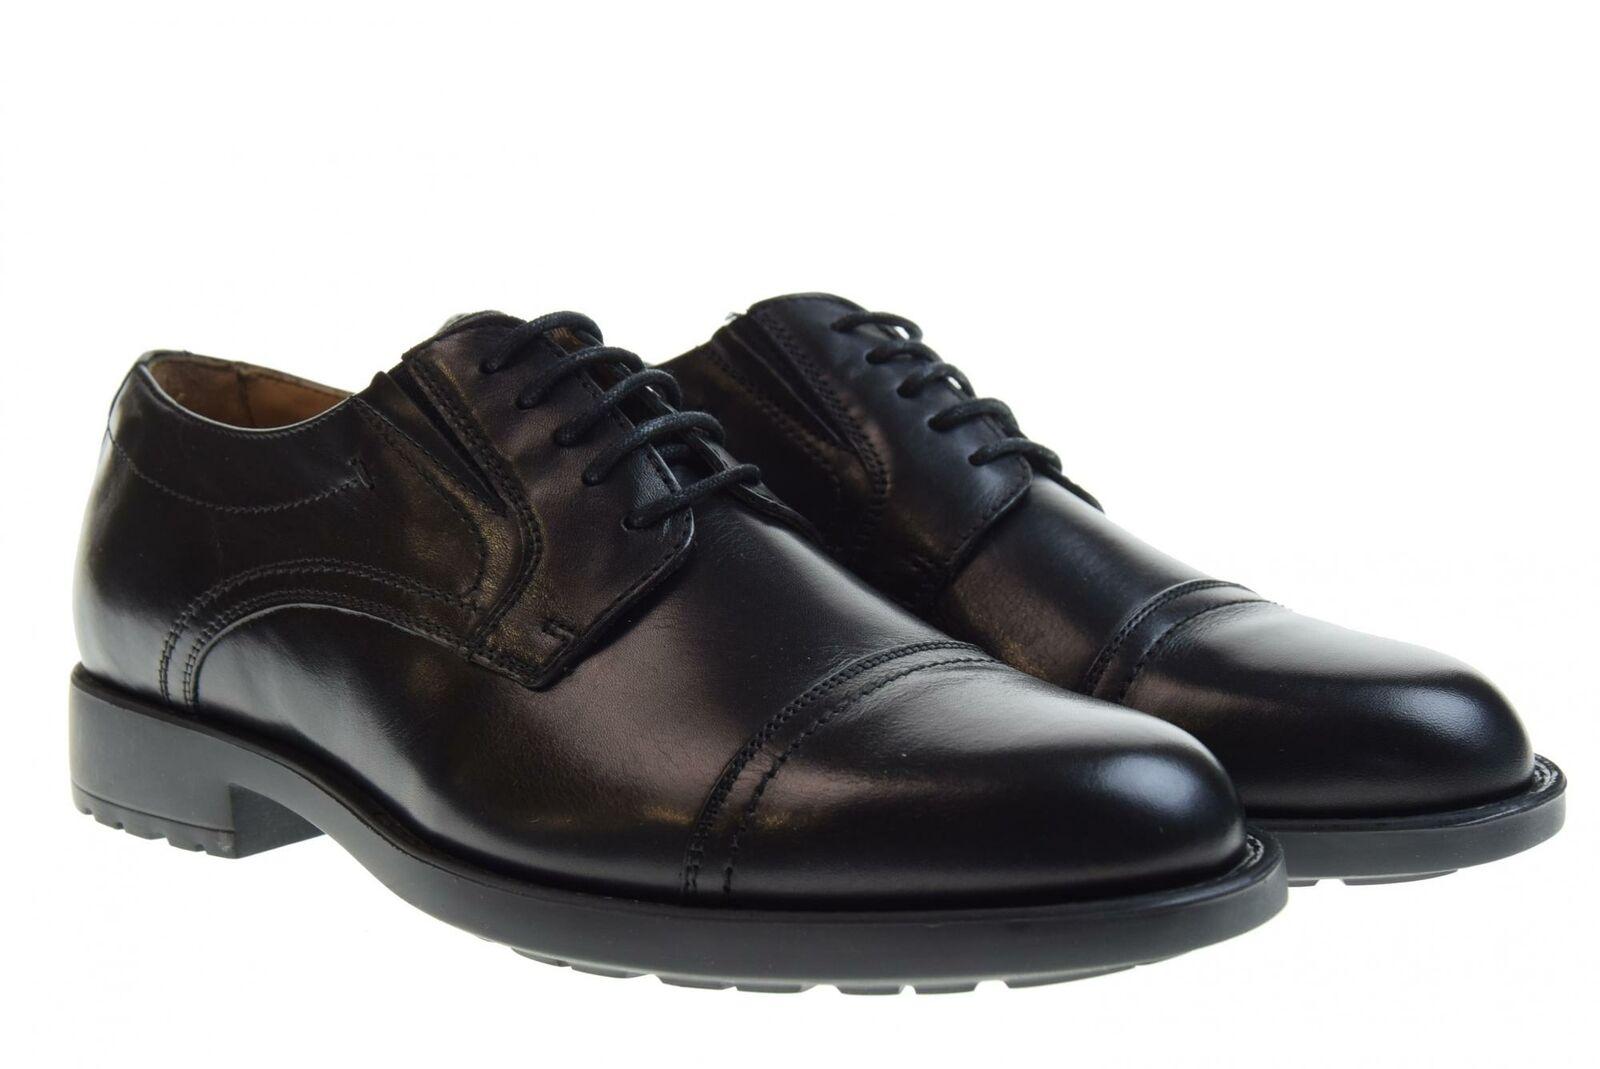 Vallegreen P19us classic men's shoes 49896 BLACK